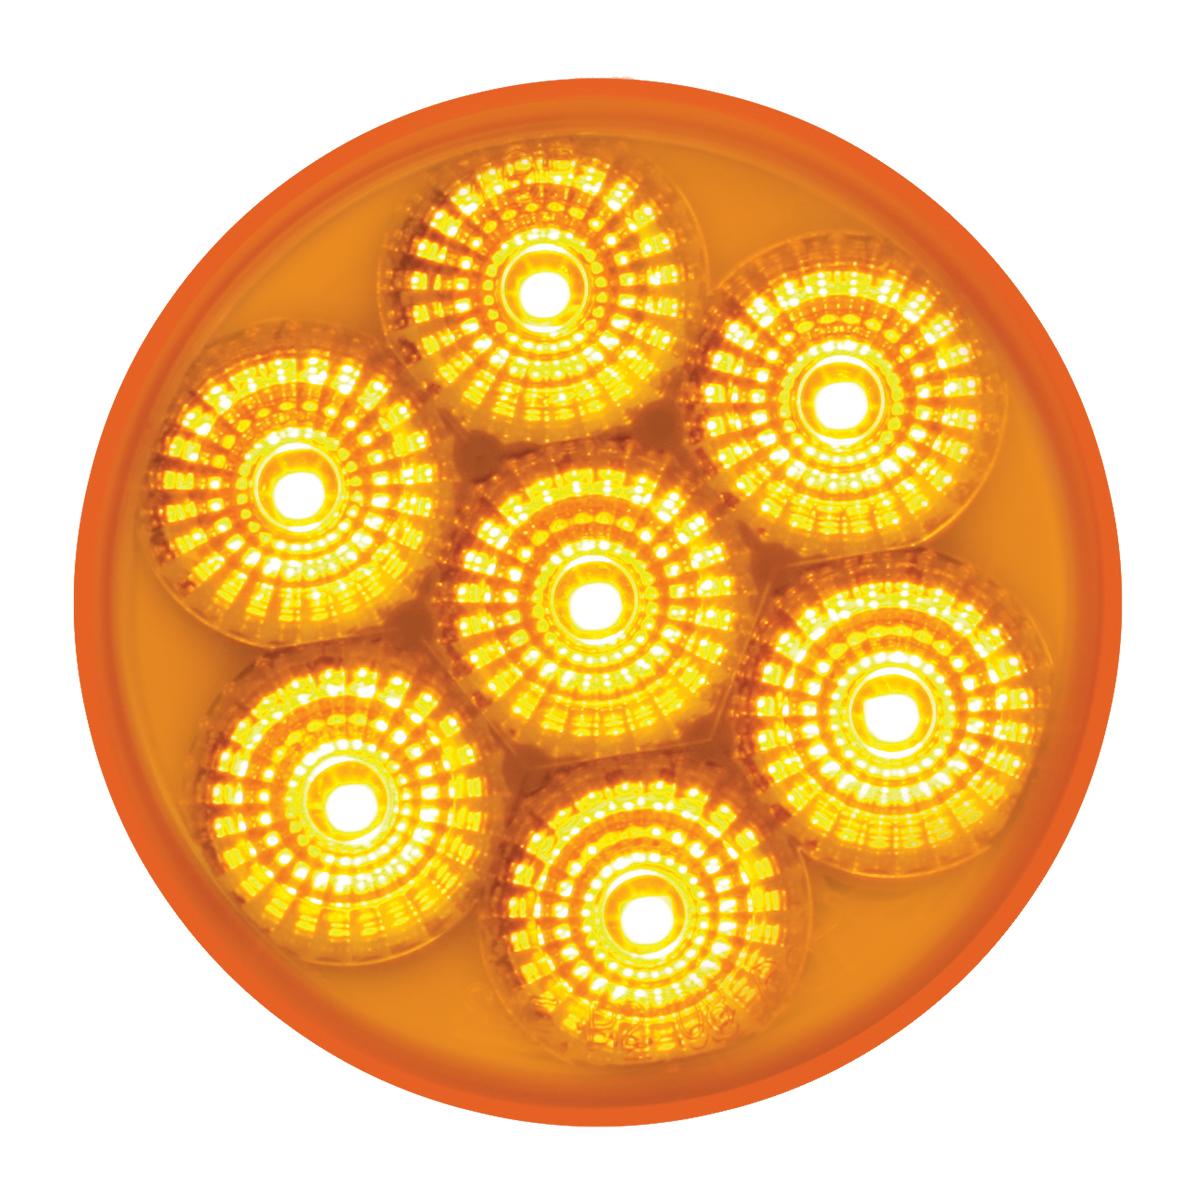 "76665 2-1/2"" Dual Function Spyder LED Light"